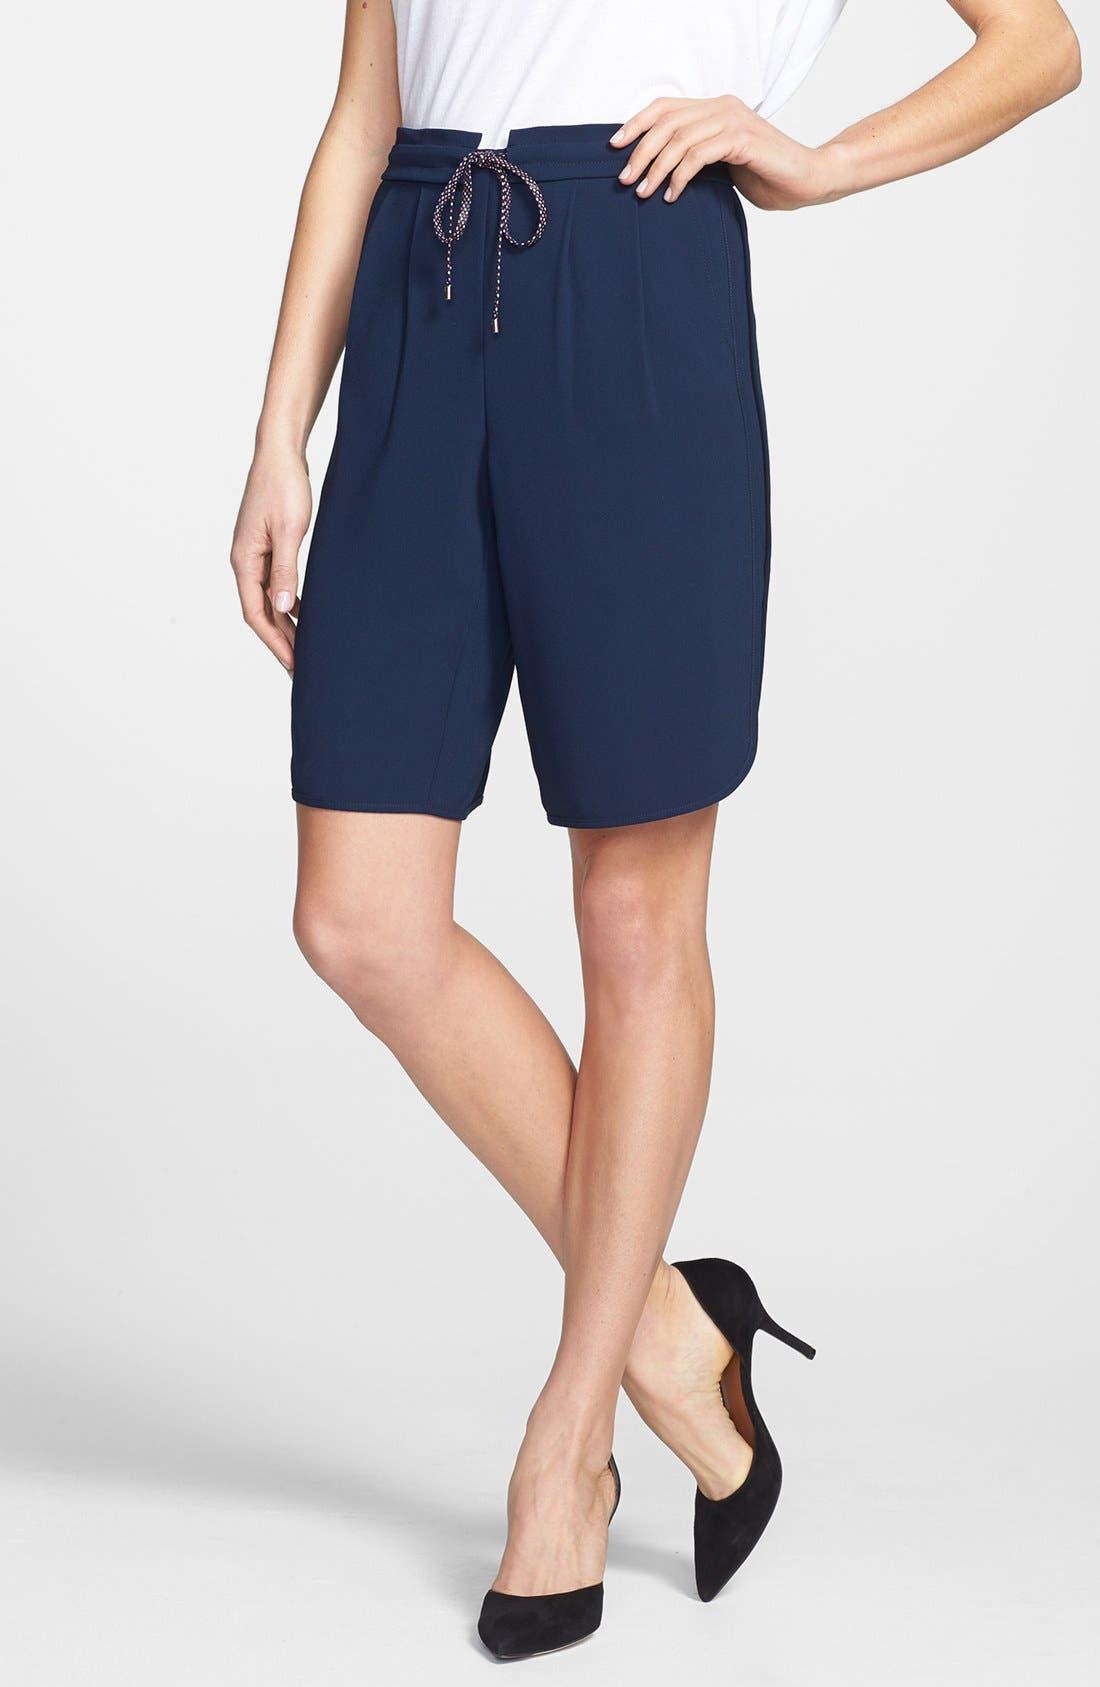 Alternate Image 1 Selected - Trina Turk 'Kendrea' Drawstring Waist Shorts